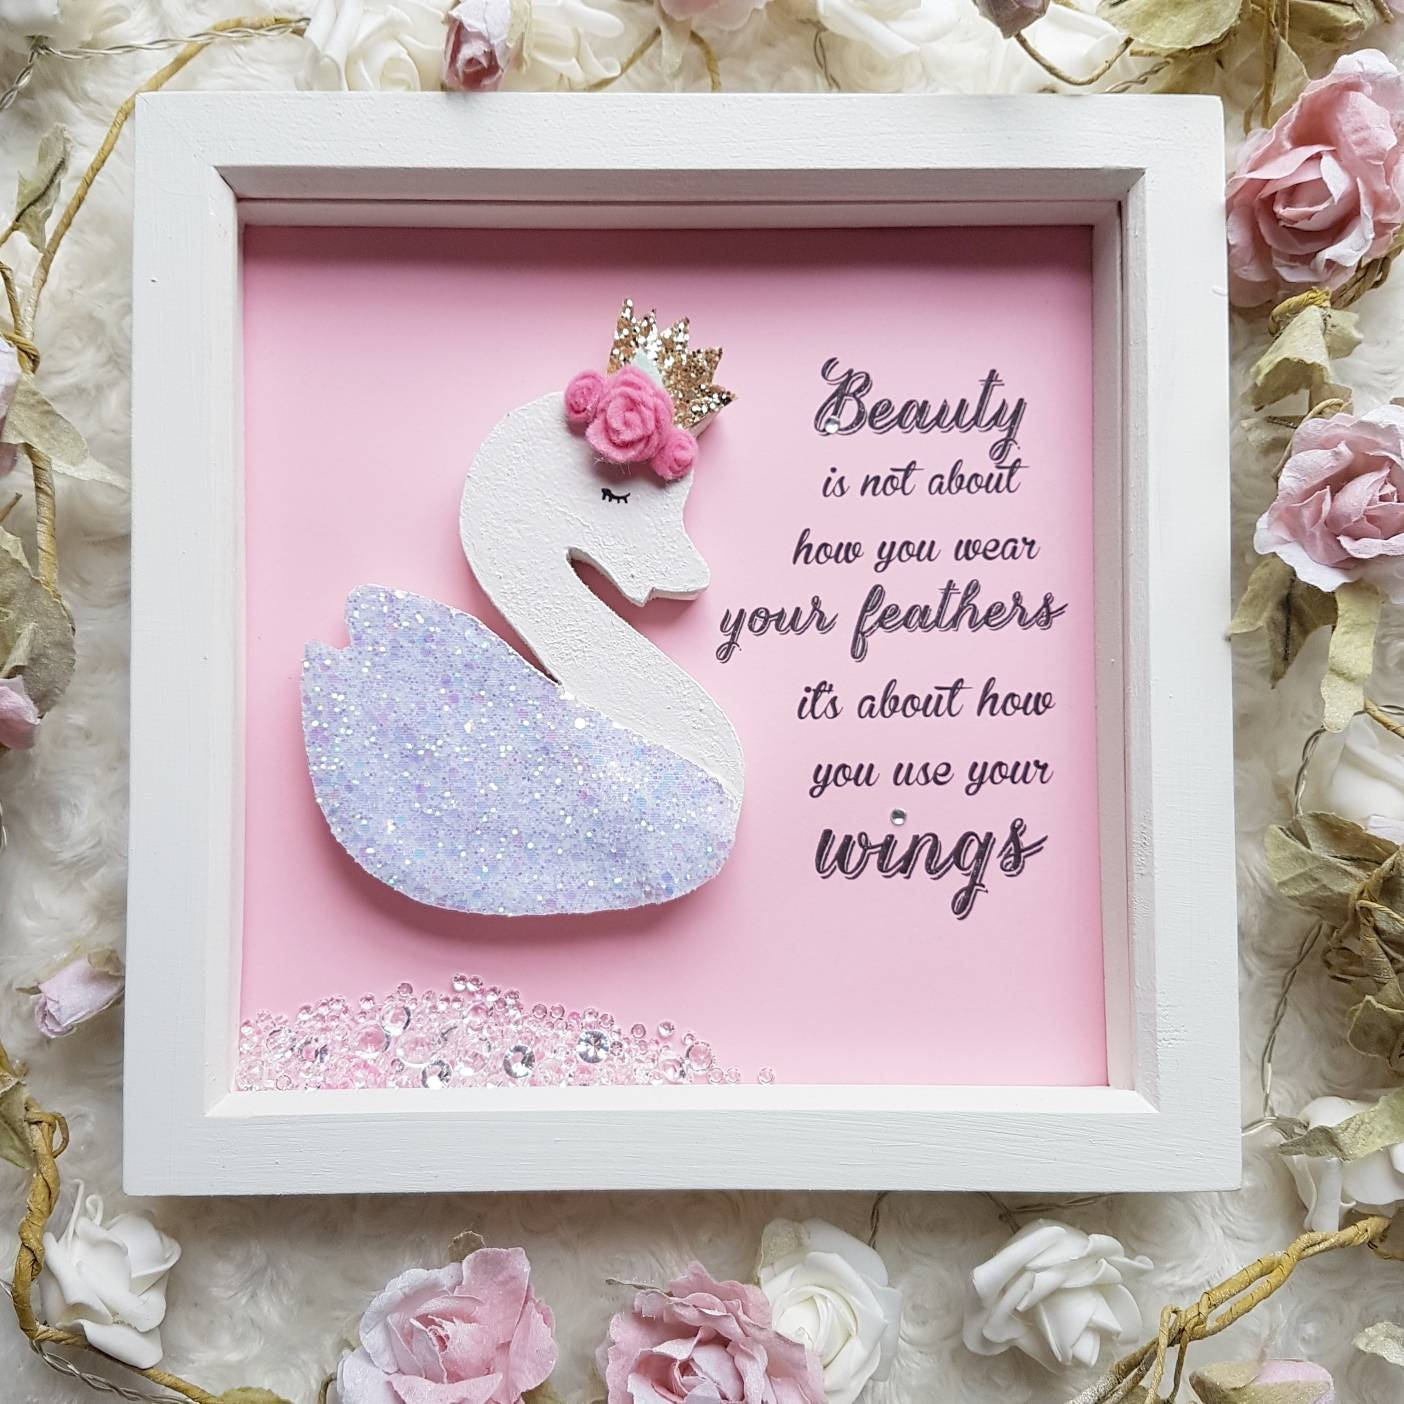 nursery frame art swan nursery decor inspirational quote | Etsy